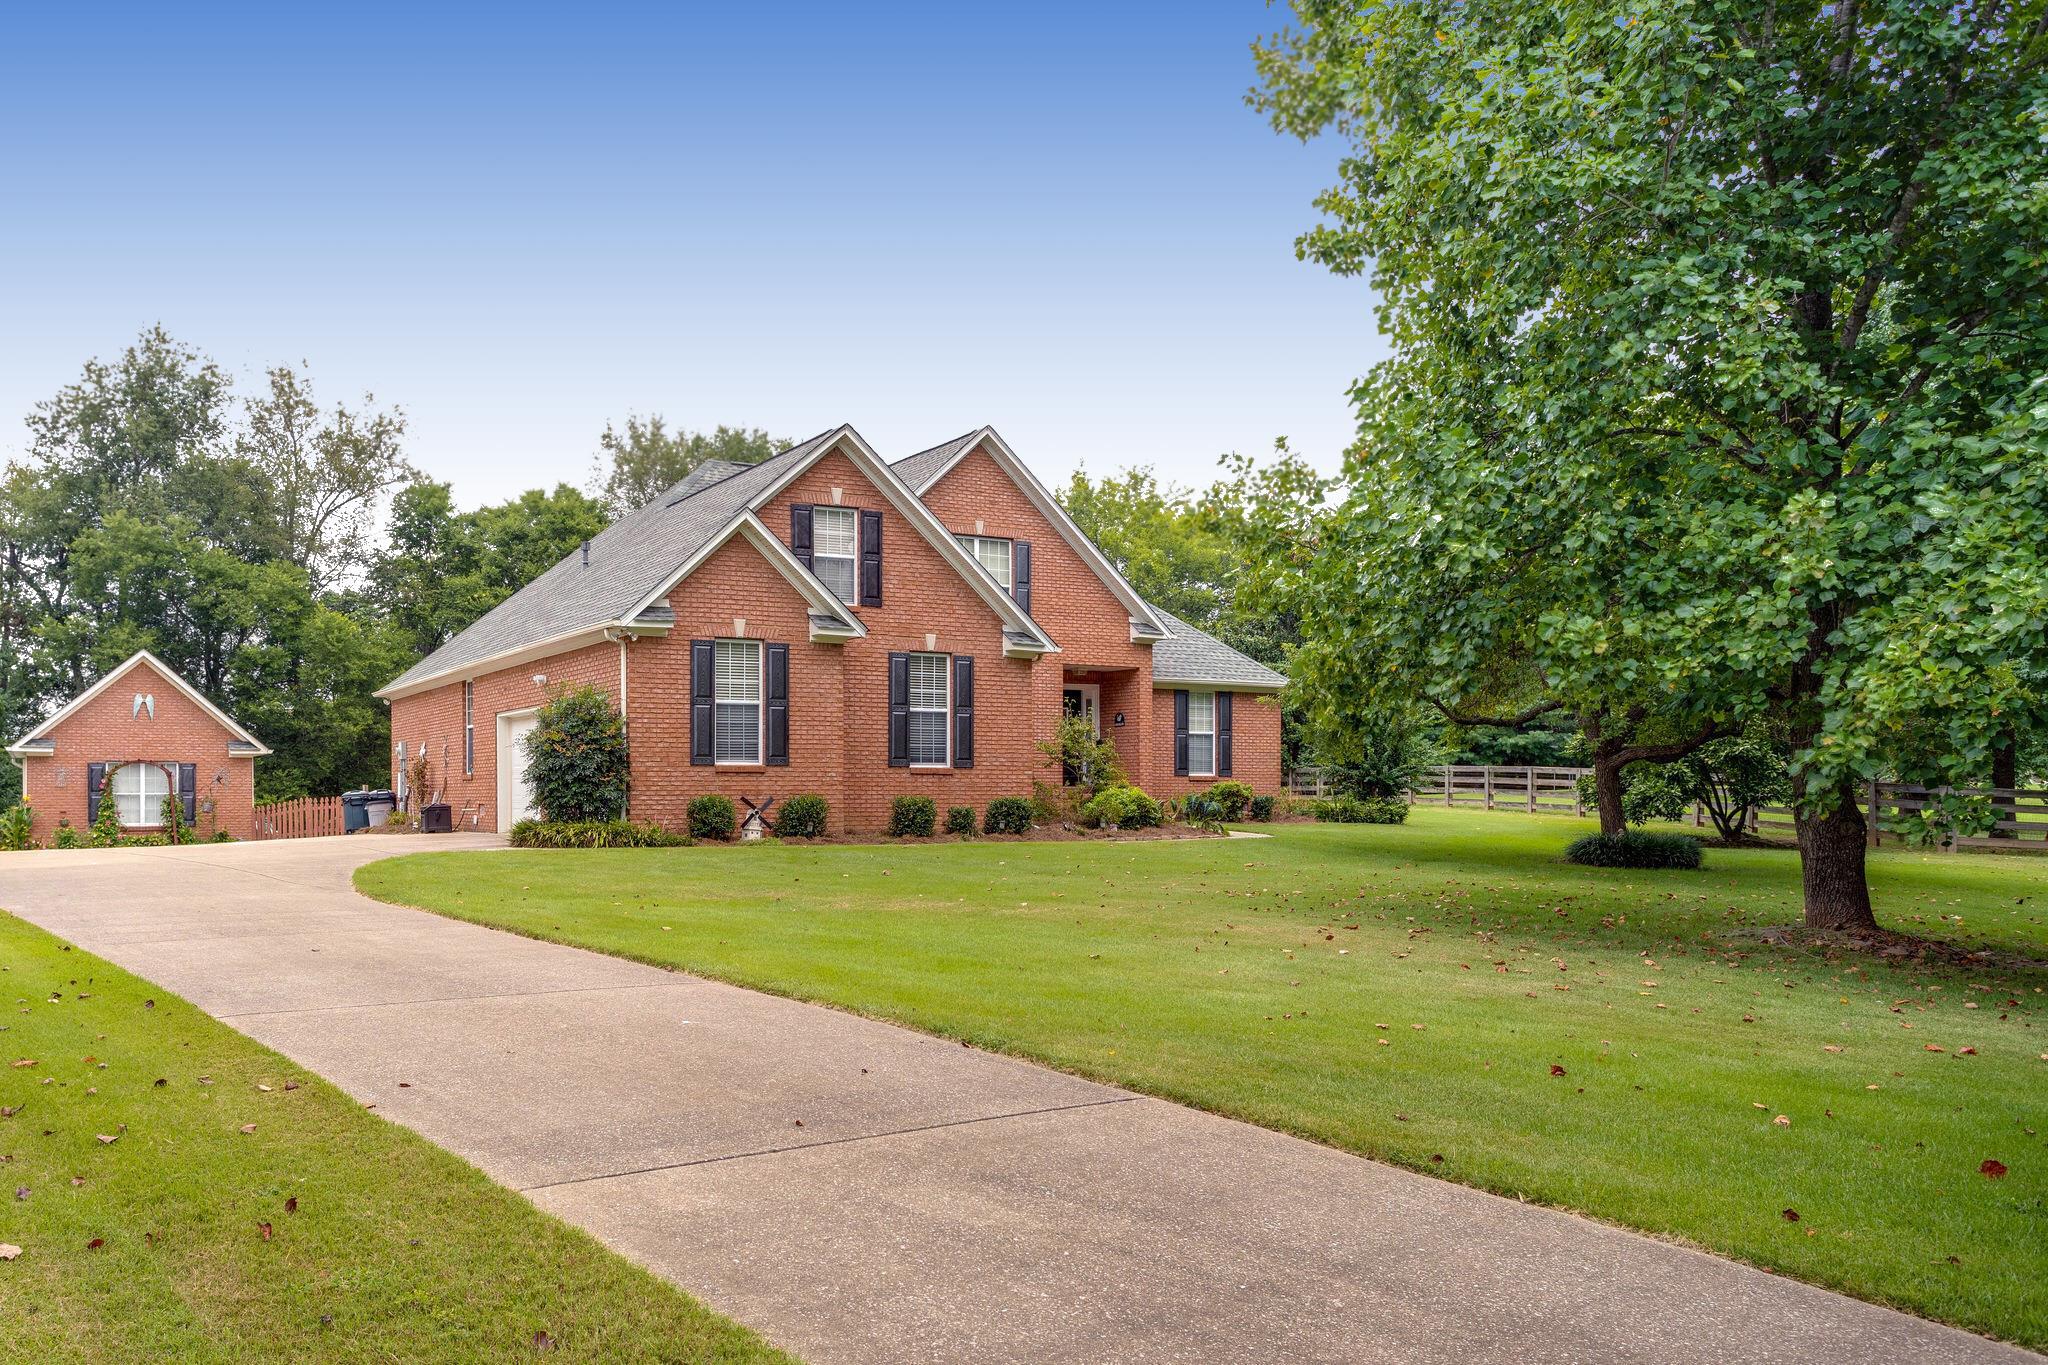 905 Everyman Ct, Columbia, TN 38401 - Columbia, TN real estate listing